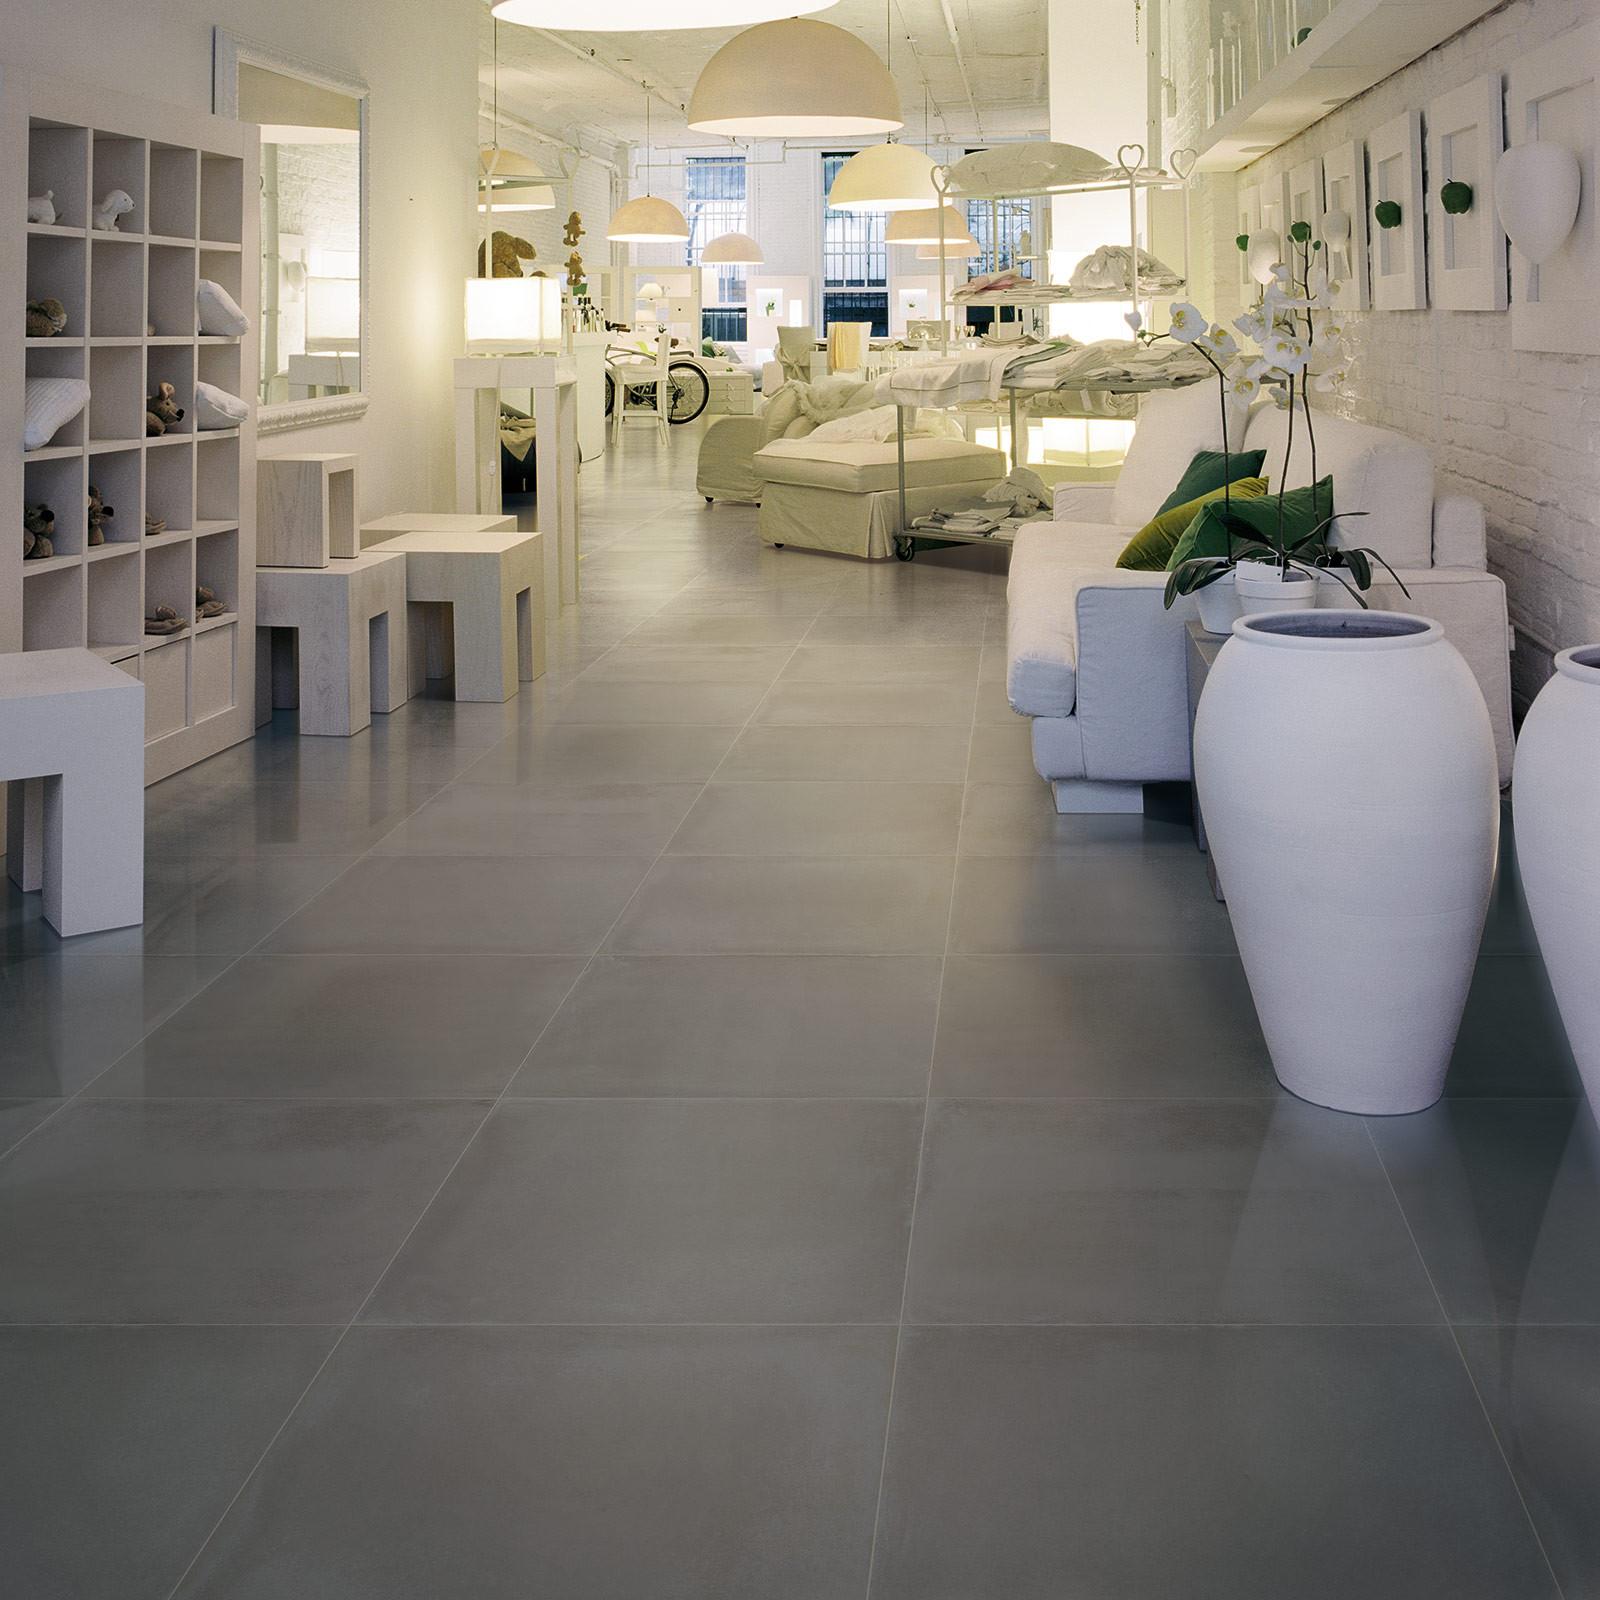 Calx grigio porcelain floor tile calx grigio porcelain wallfloor tile dailygadgetfo Gallery